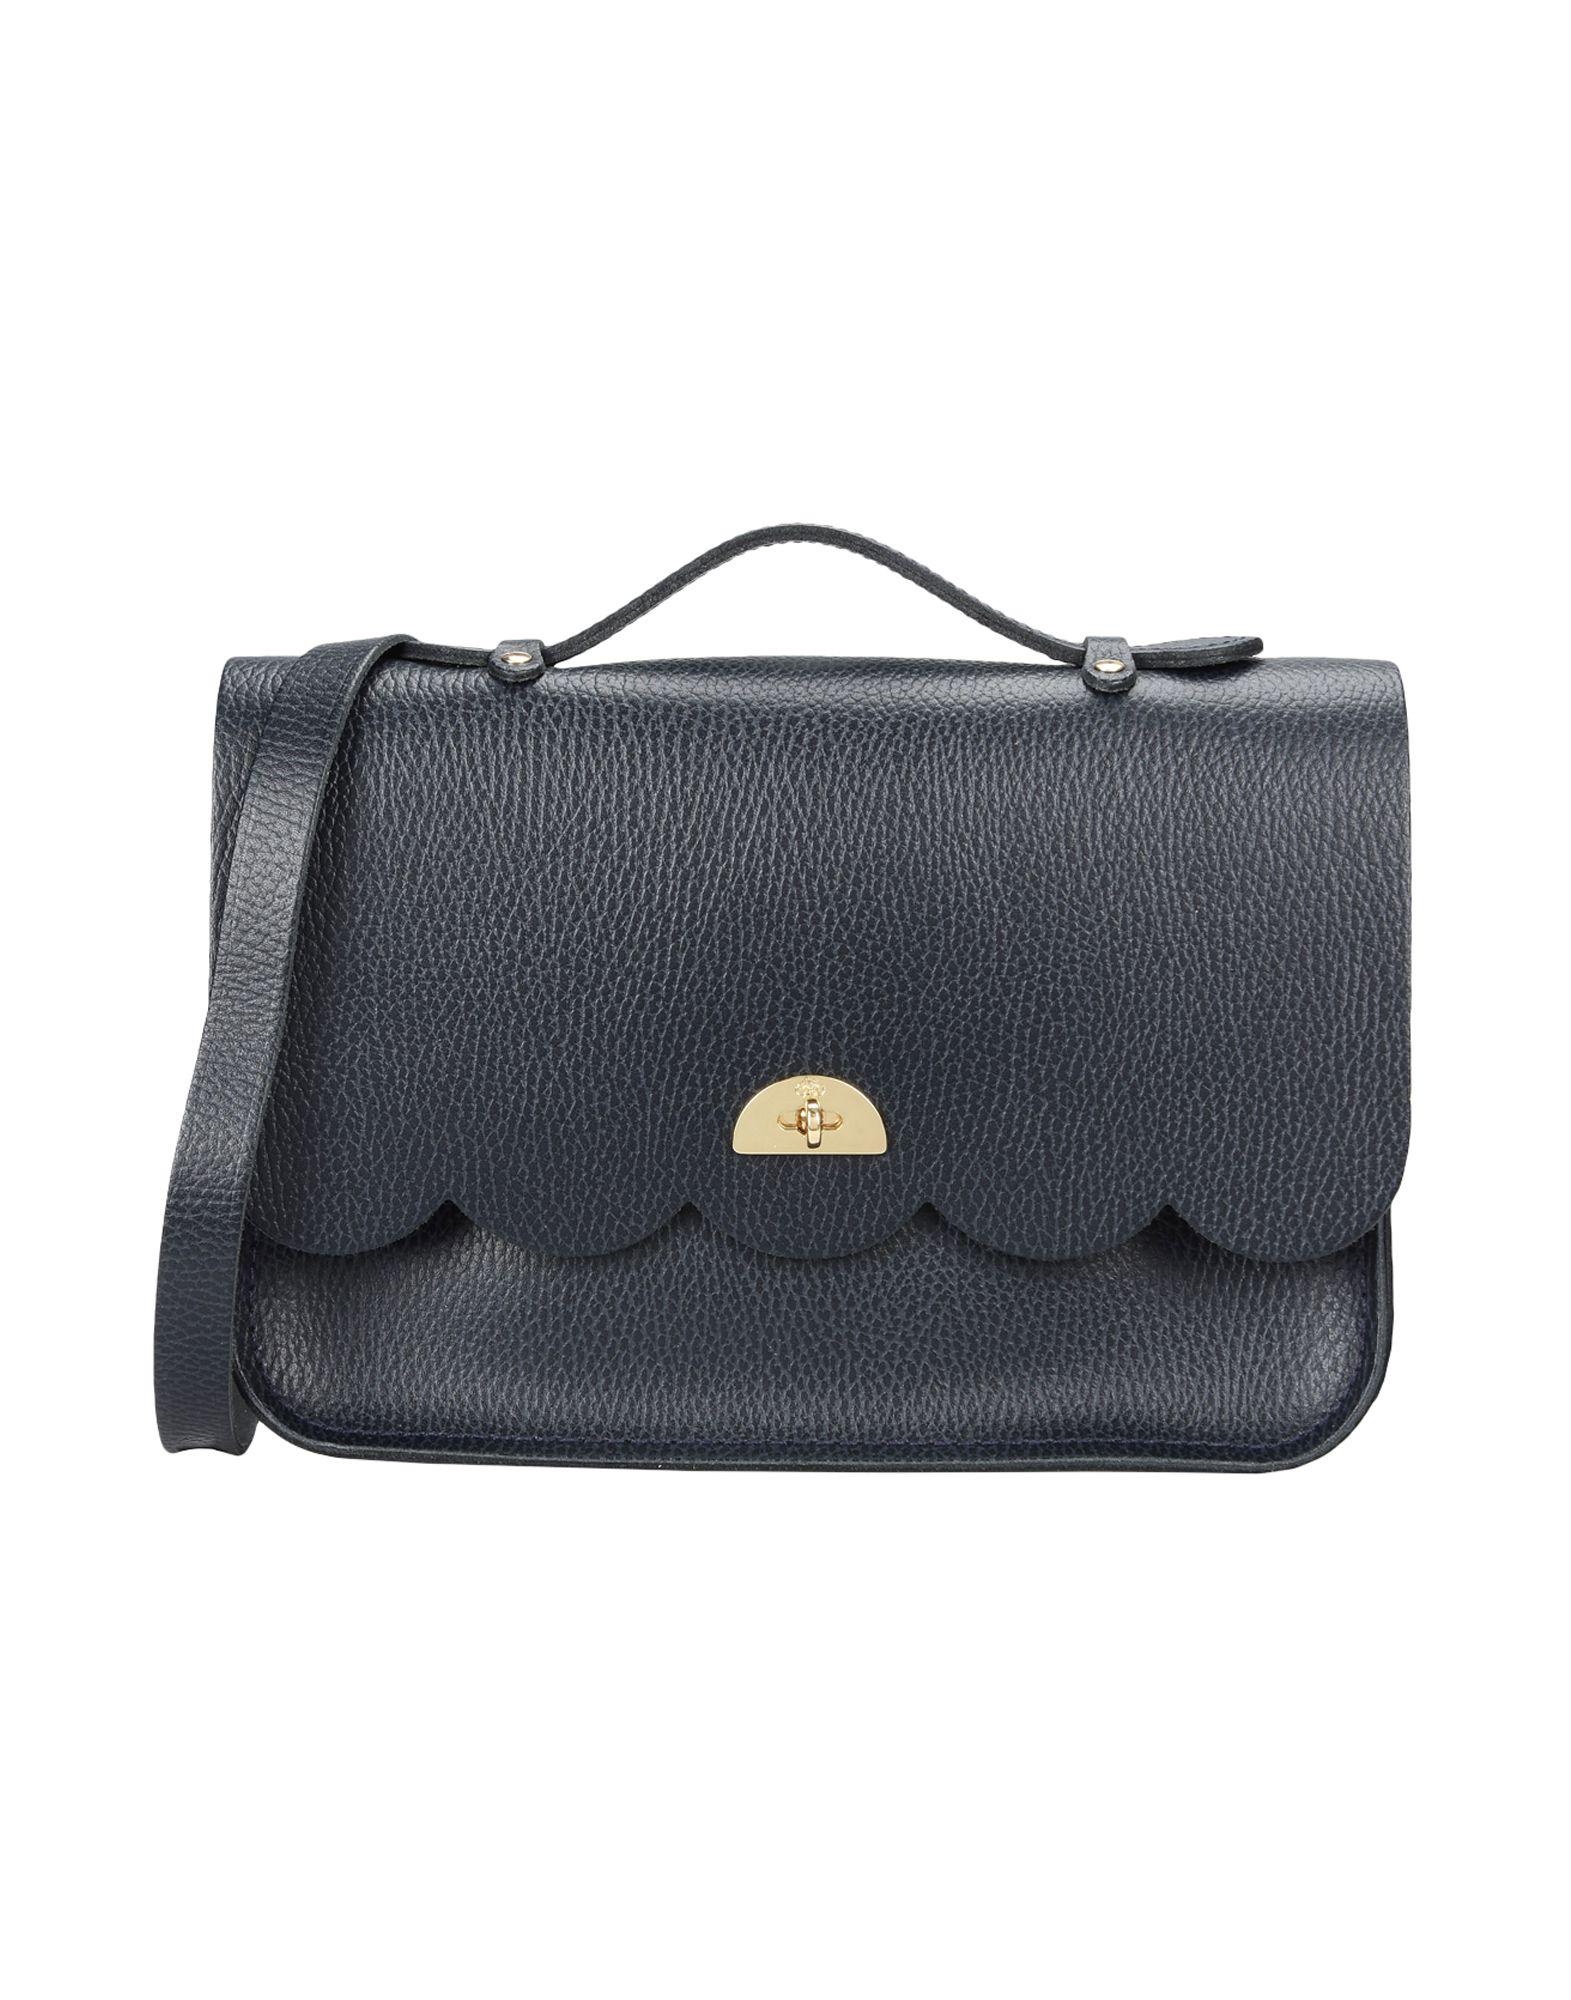 Borsa A Mano The Cambridge Satchel Company Cloud Bag With Handle - Donna - Acquista online su